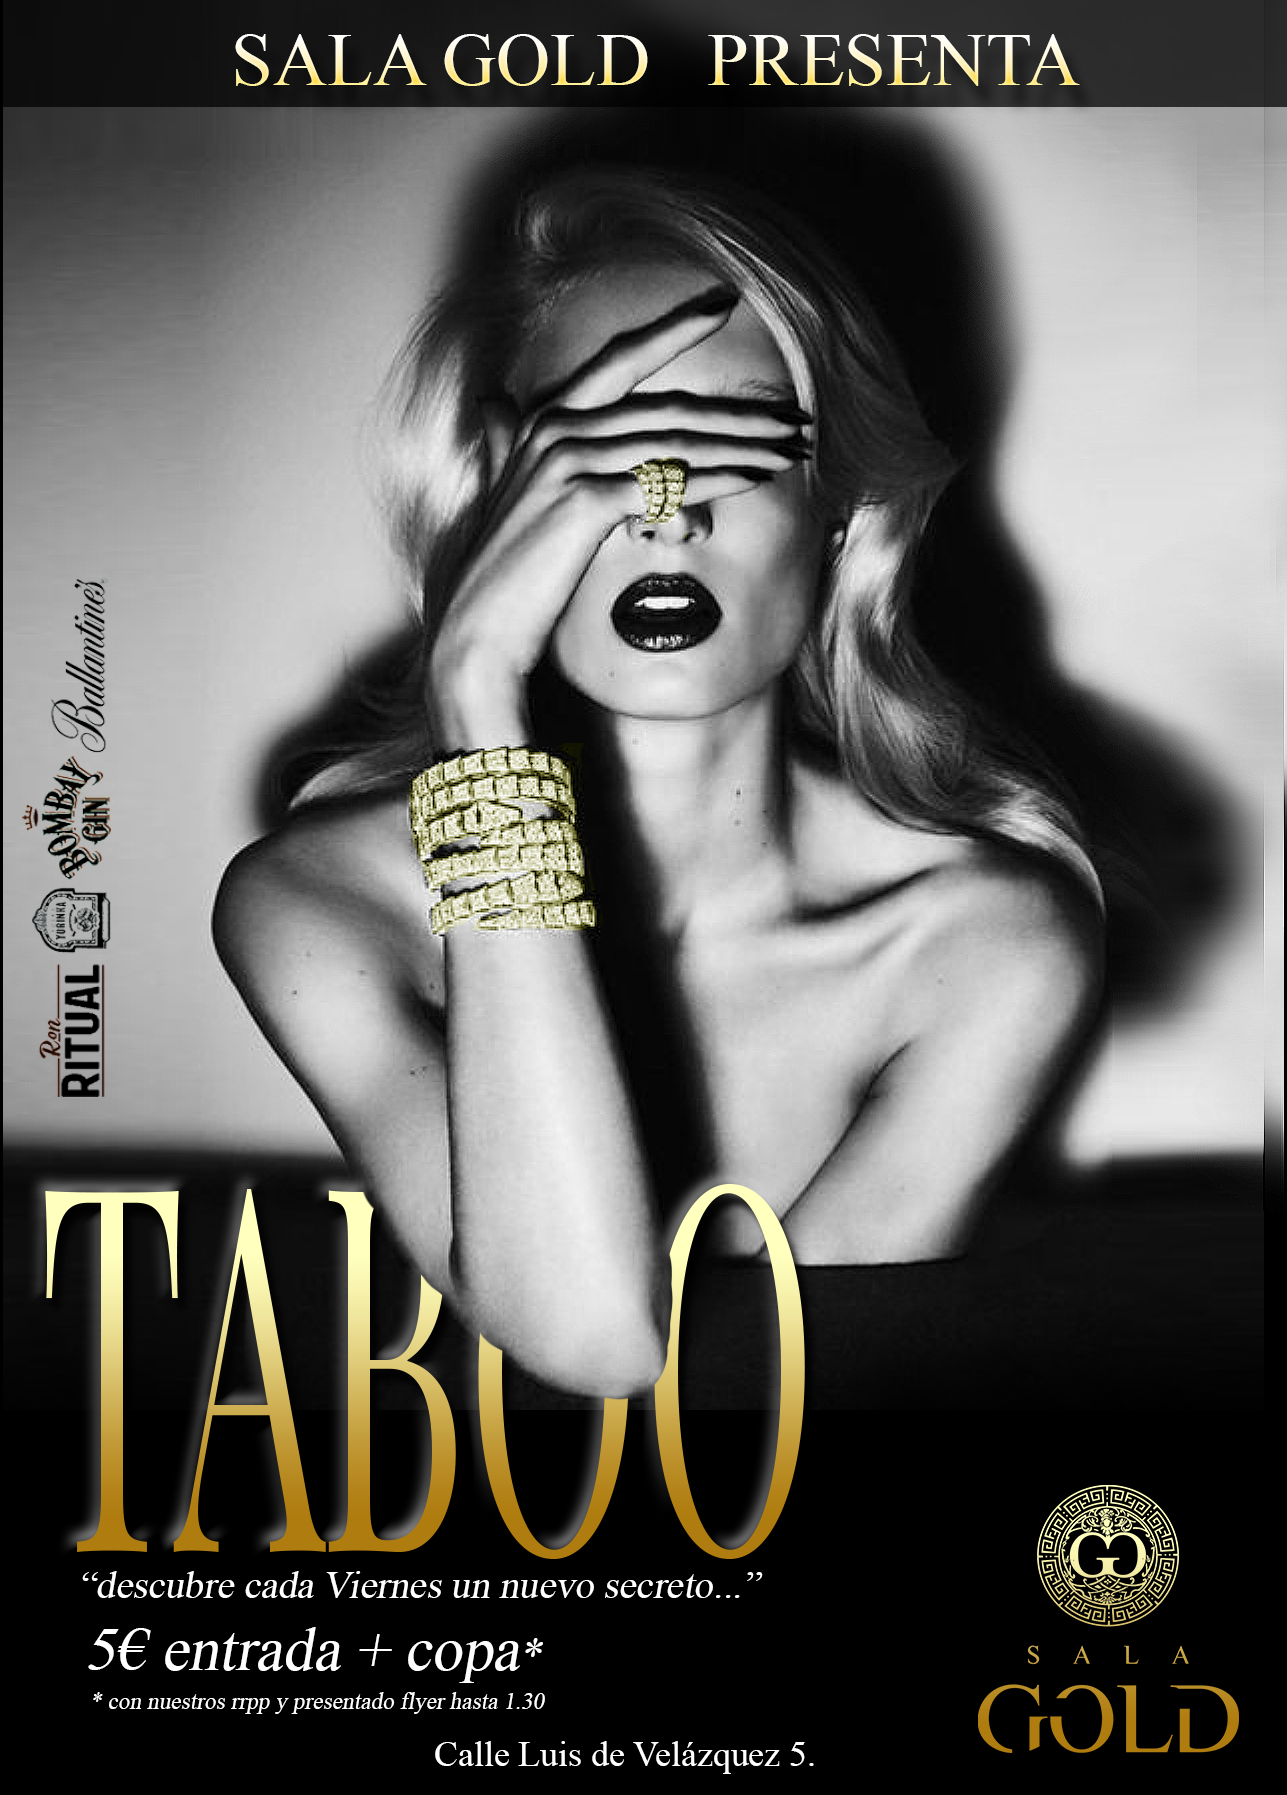 TABOO SALA GOLD